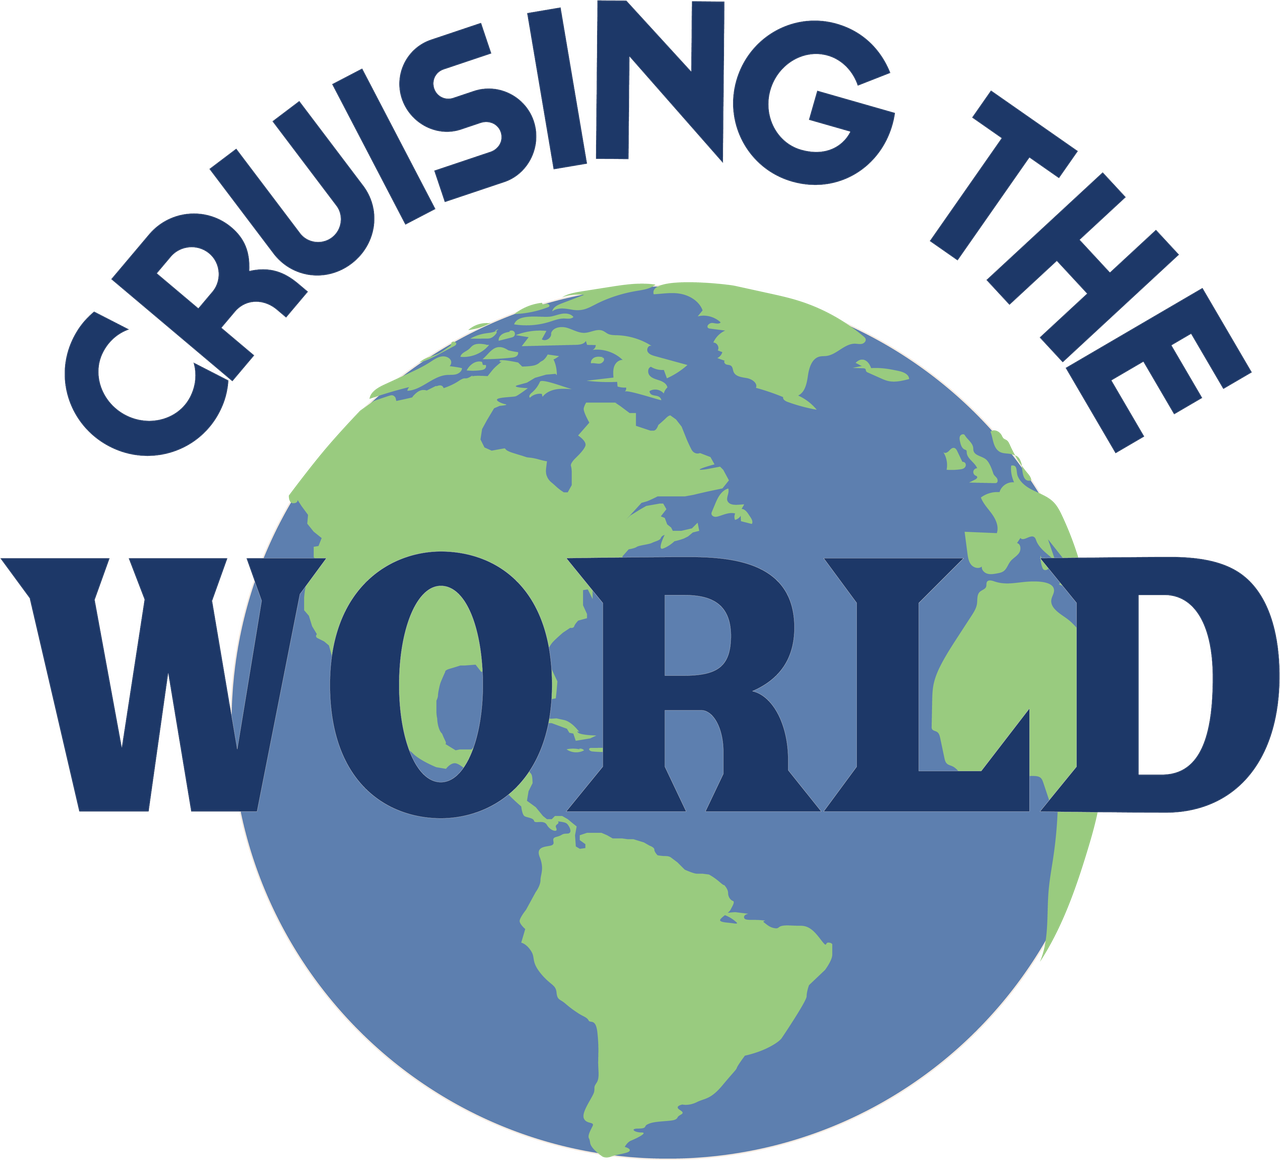 Cruising The World SVG Cut File